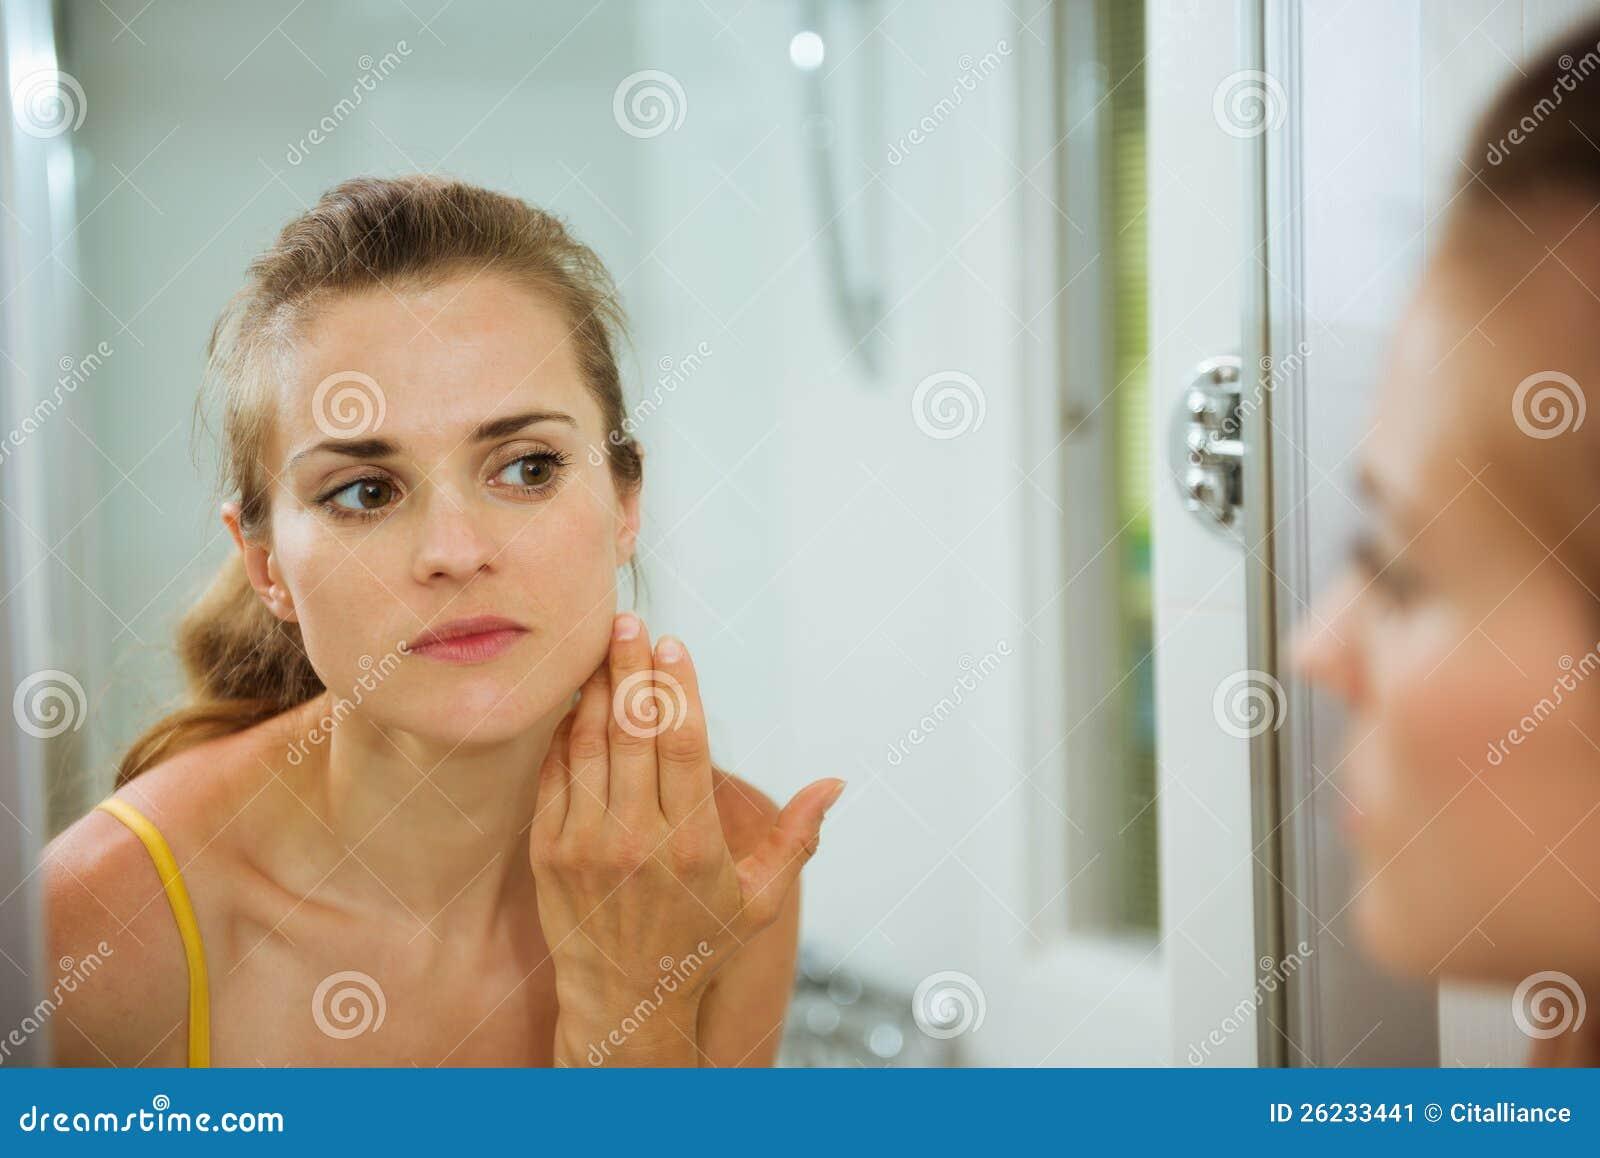 Bathtub young stud facial